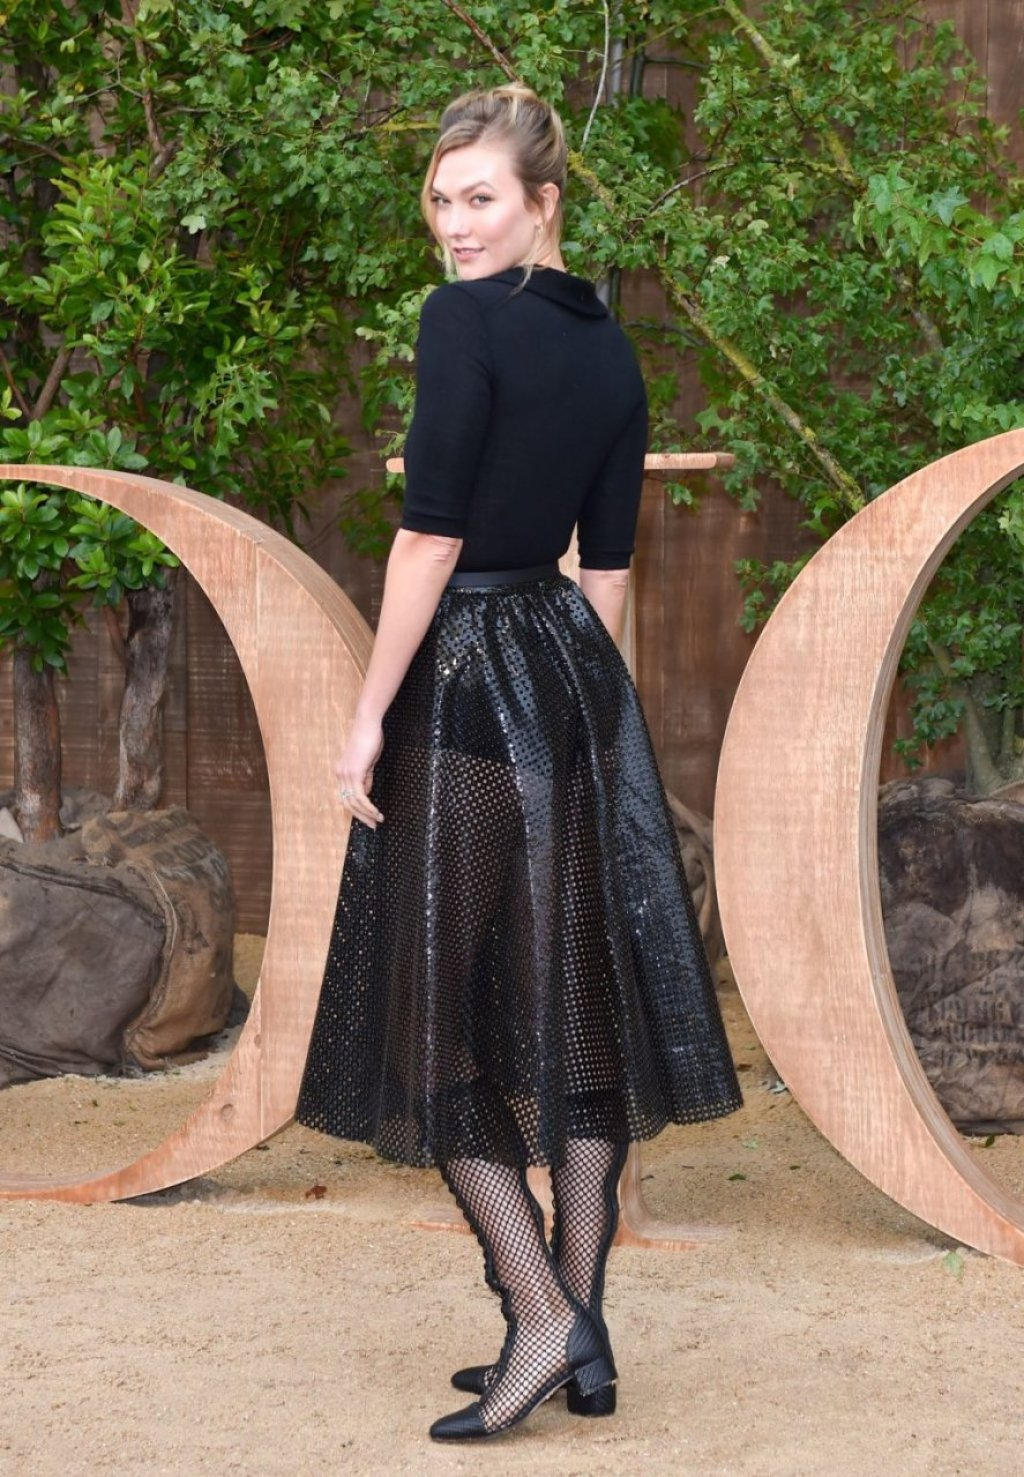 Karlie Kloss See Through (91 Photos)